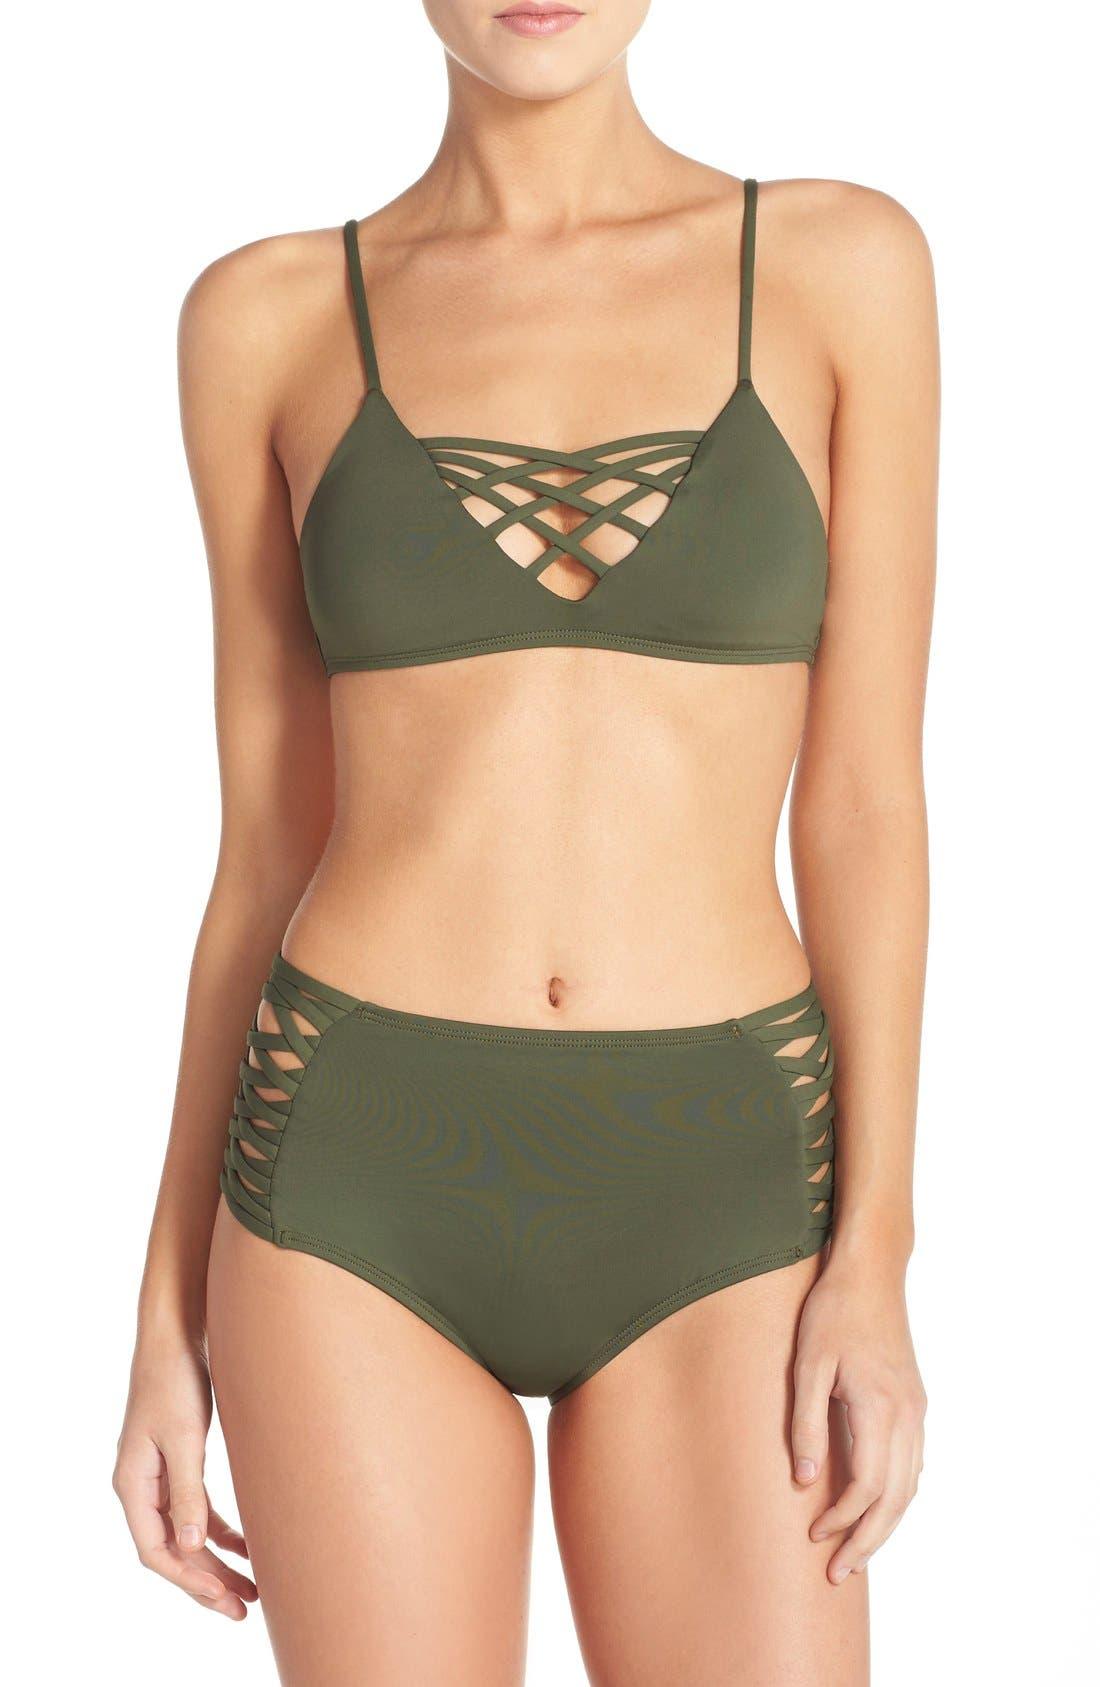 Tigress Classic High Waist Bikini Bottoms,                             Alternate thumbnail 4, color,                             Fern